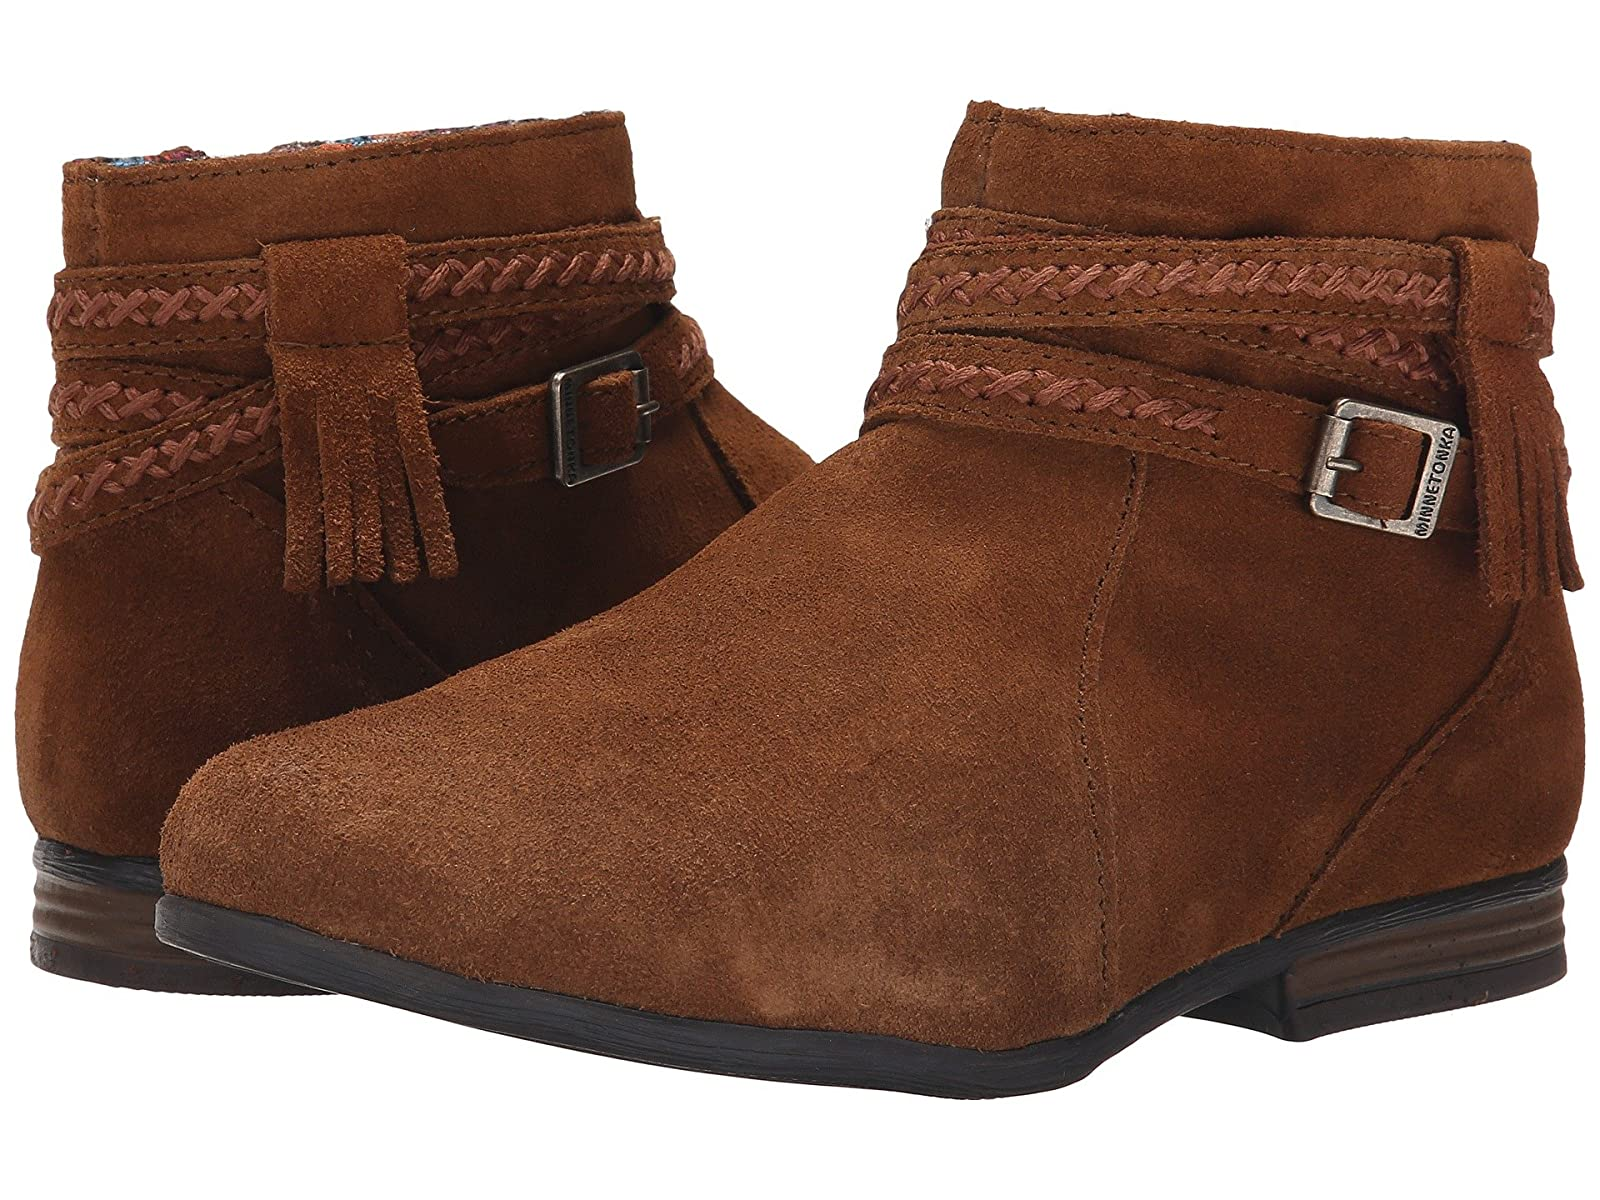 Minnetonka Dixon BootEconomical and quality shoes